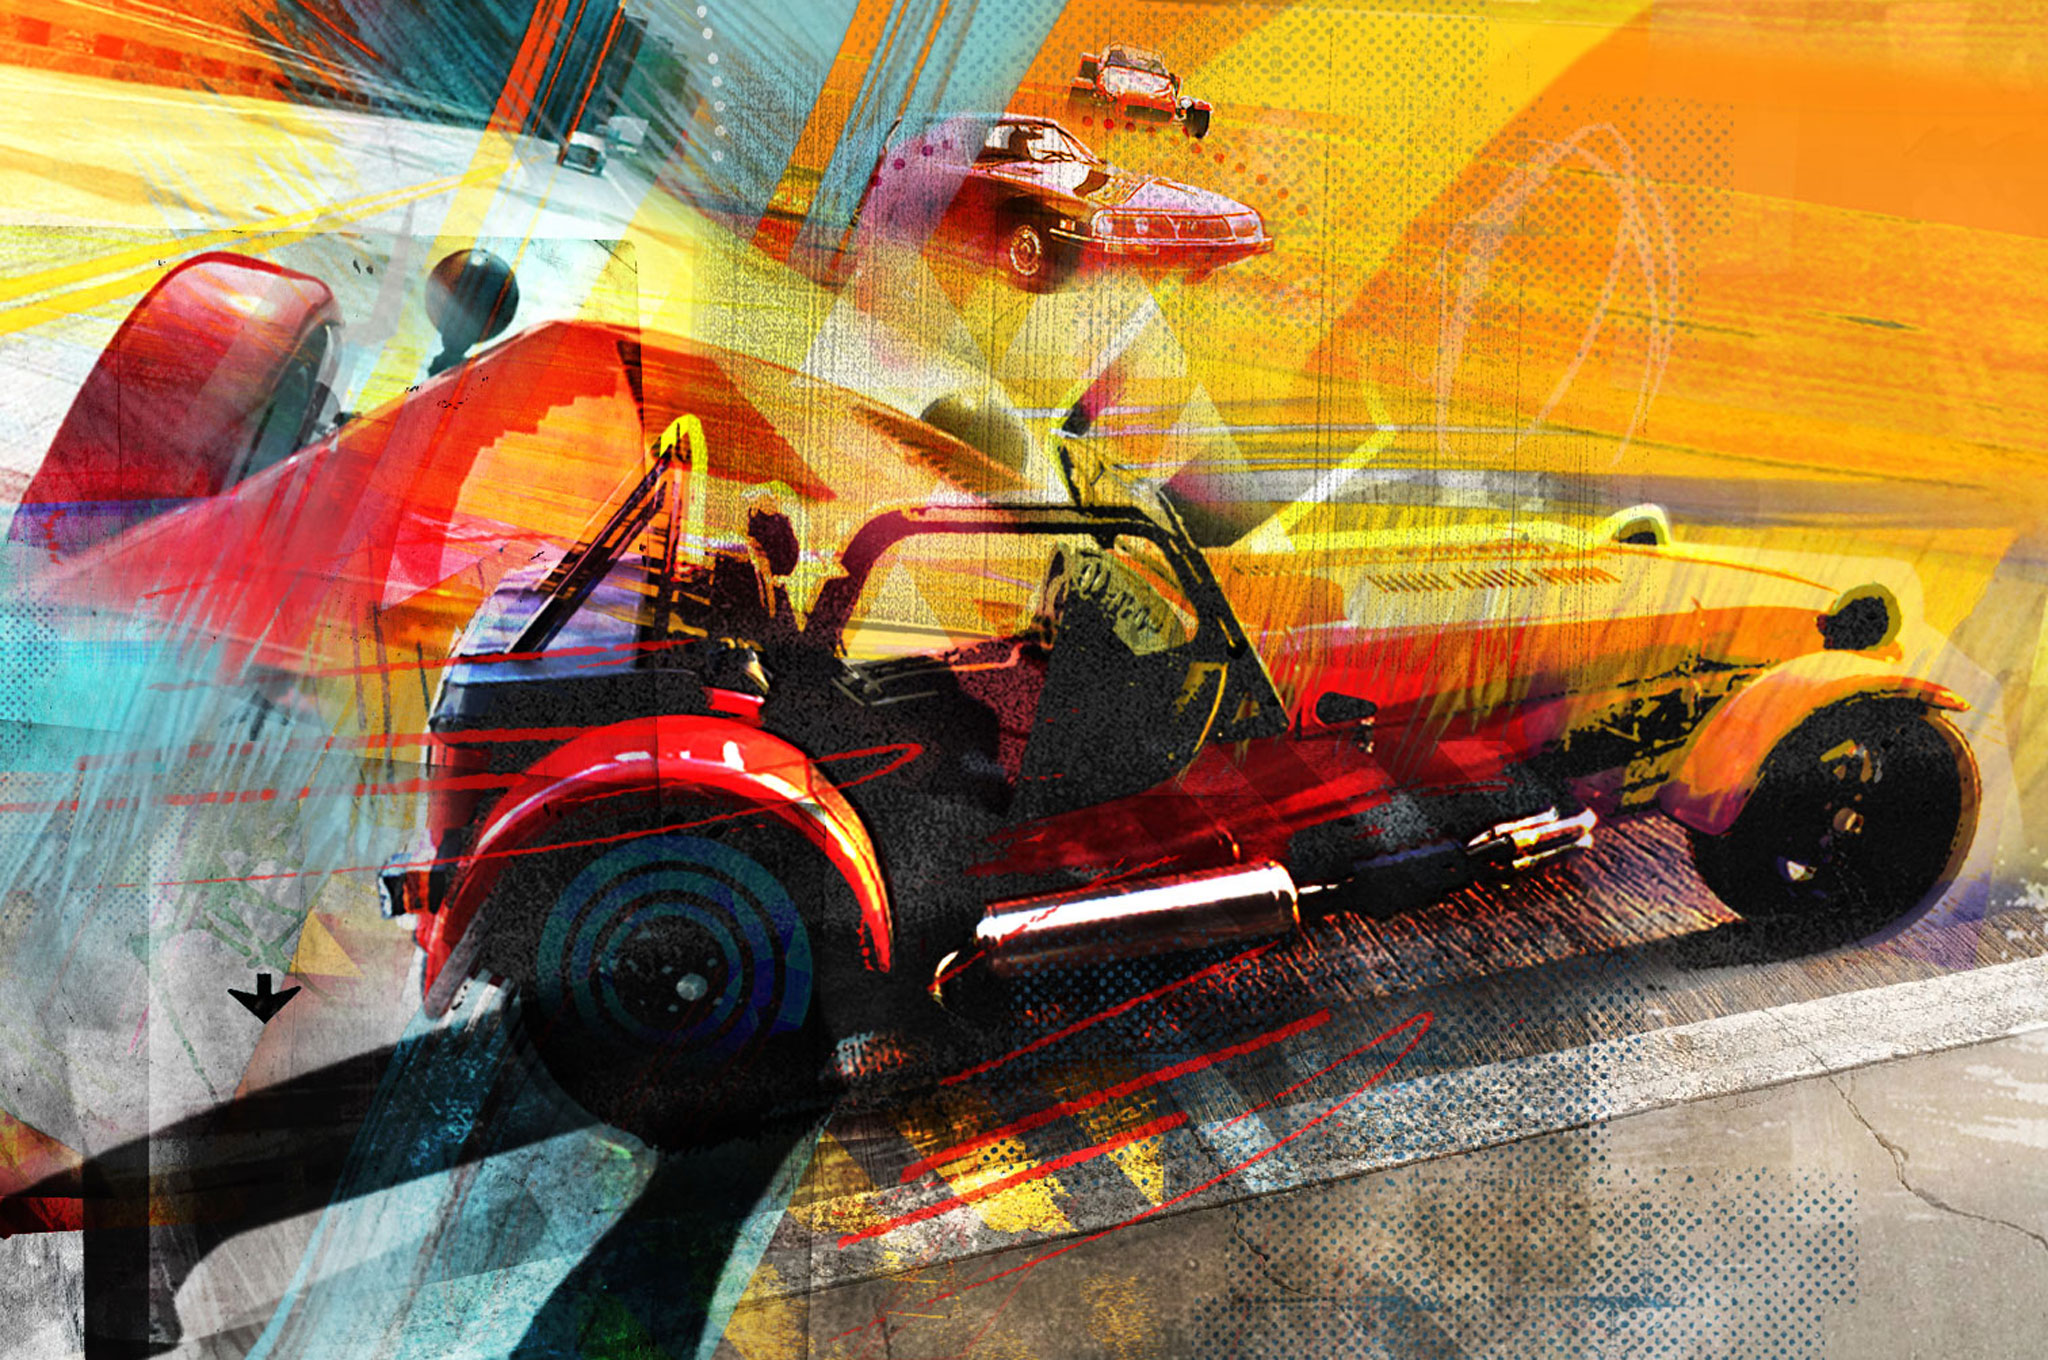 Noise Vibration Harshness Illustration Nov 2014